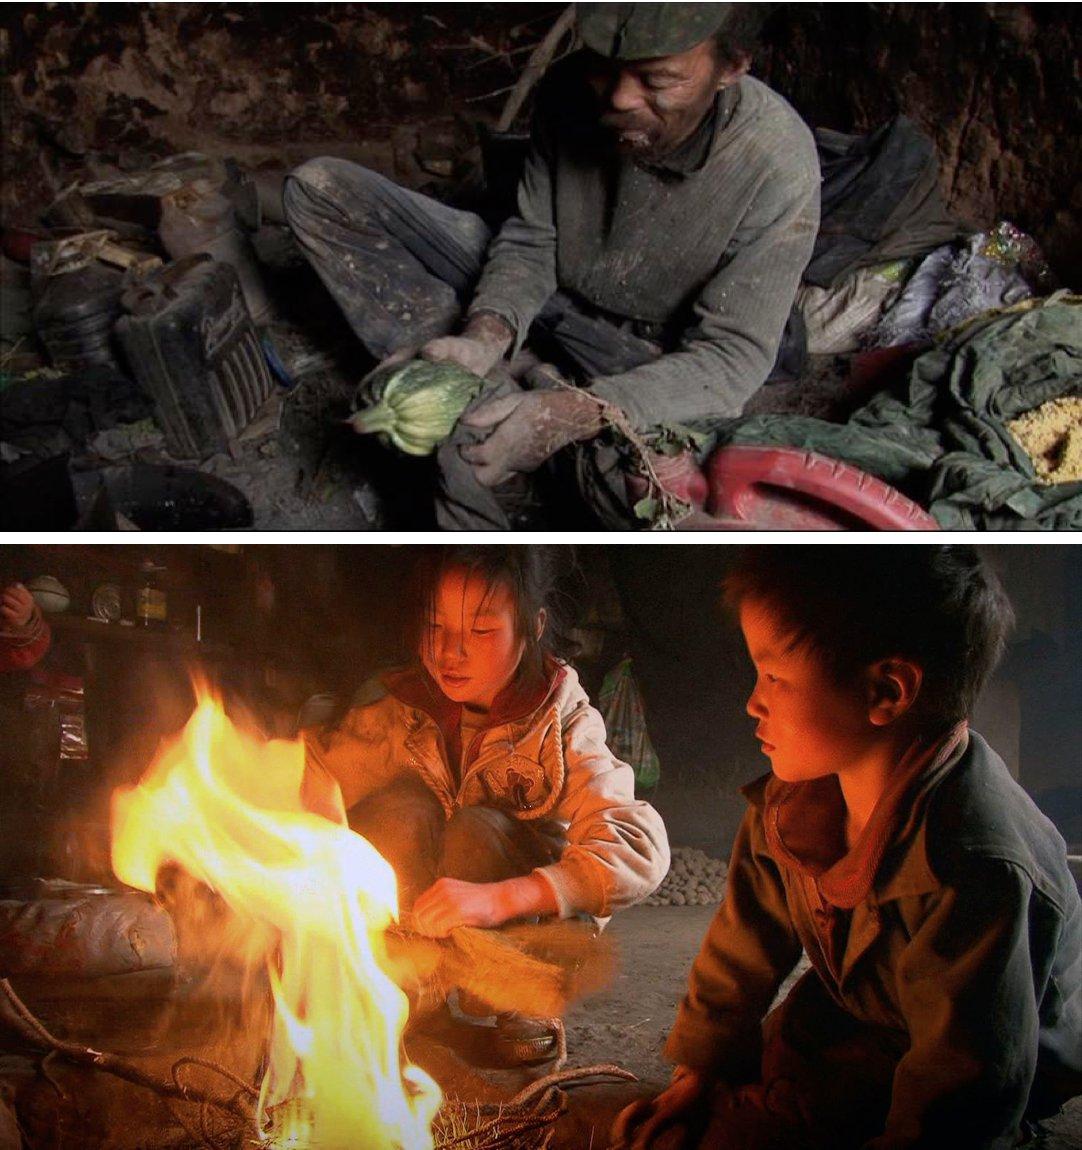 L'Homme sans nom (Wang Bing, 2009) / Les Trois sœurs du Yunnan (Wang Bing, 2013).